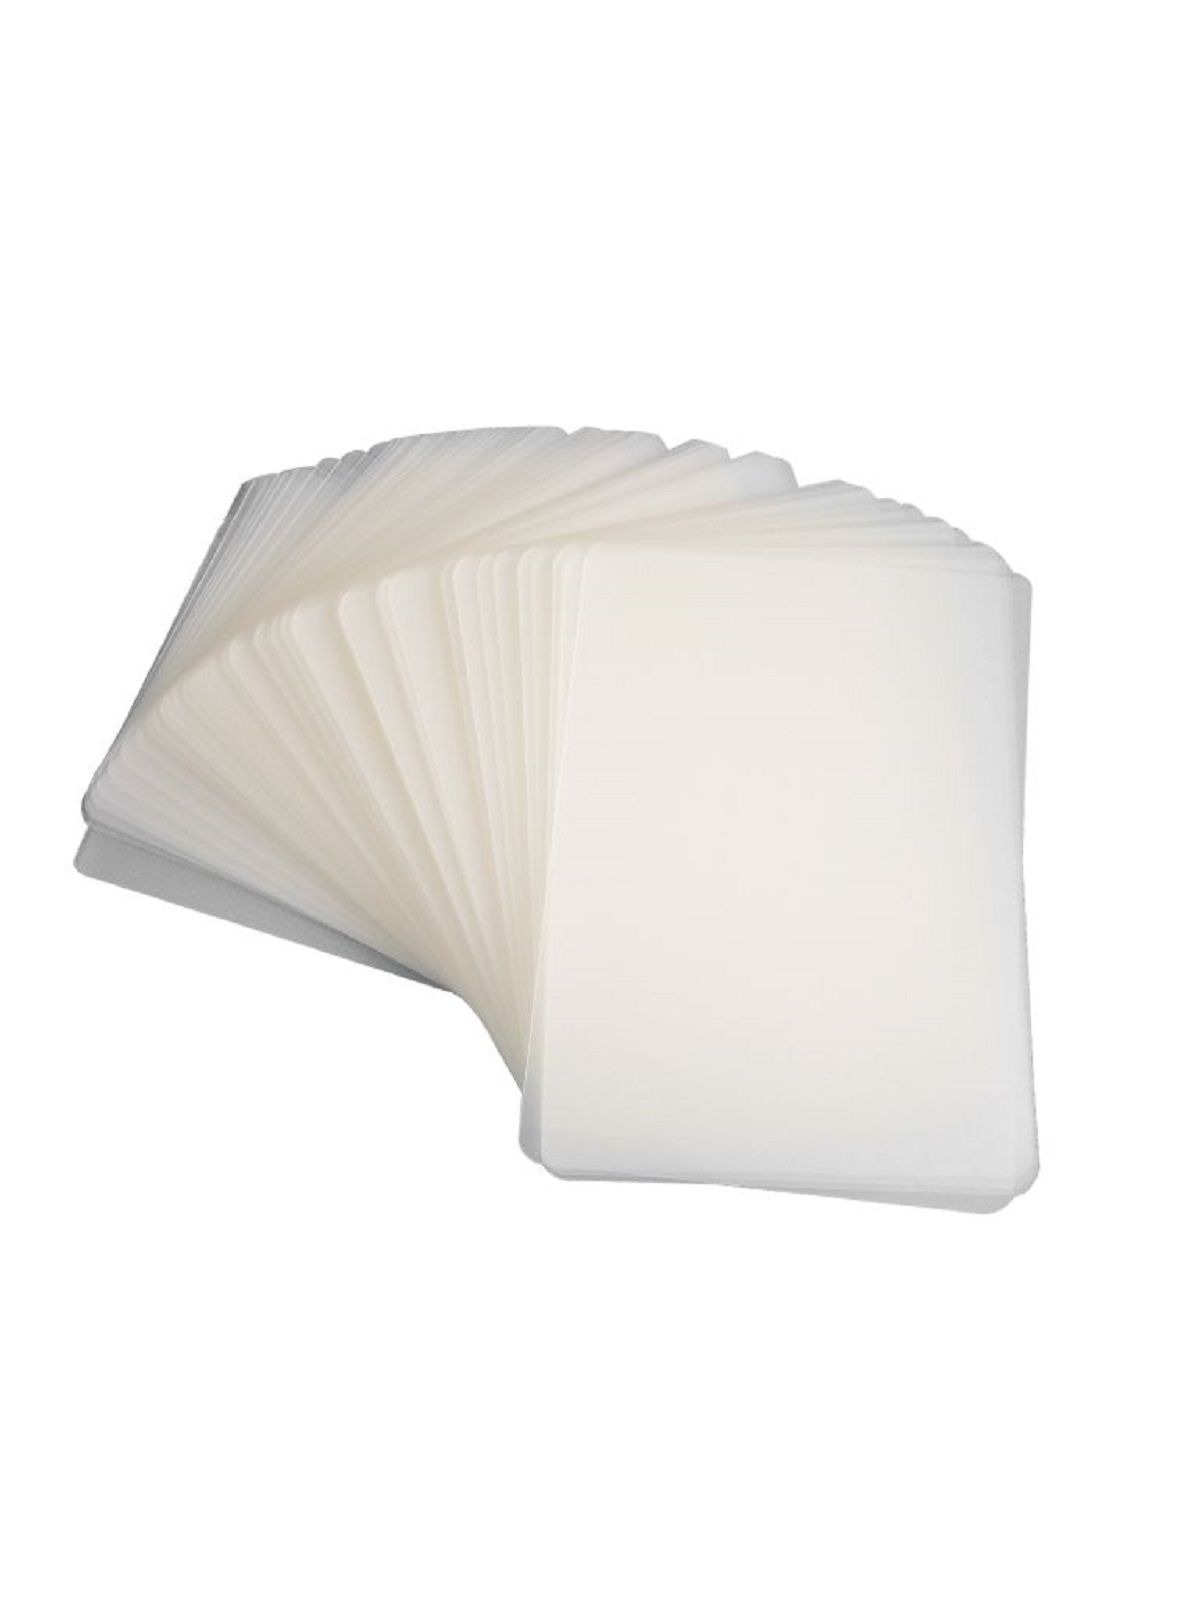 Kit 1000 Plásticos Polaseal para Plastificação CNPJ 121x191x0,07mm (175 micras)  - Click Suprimentos